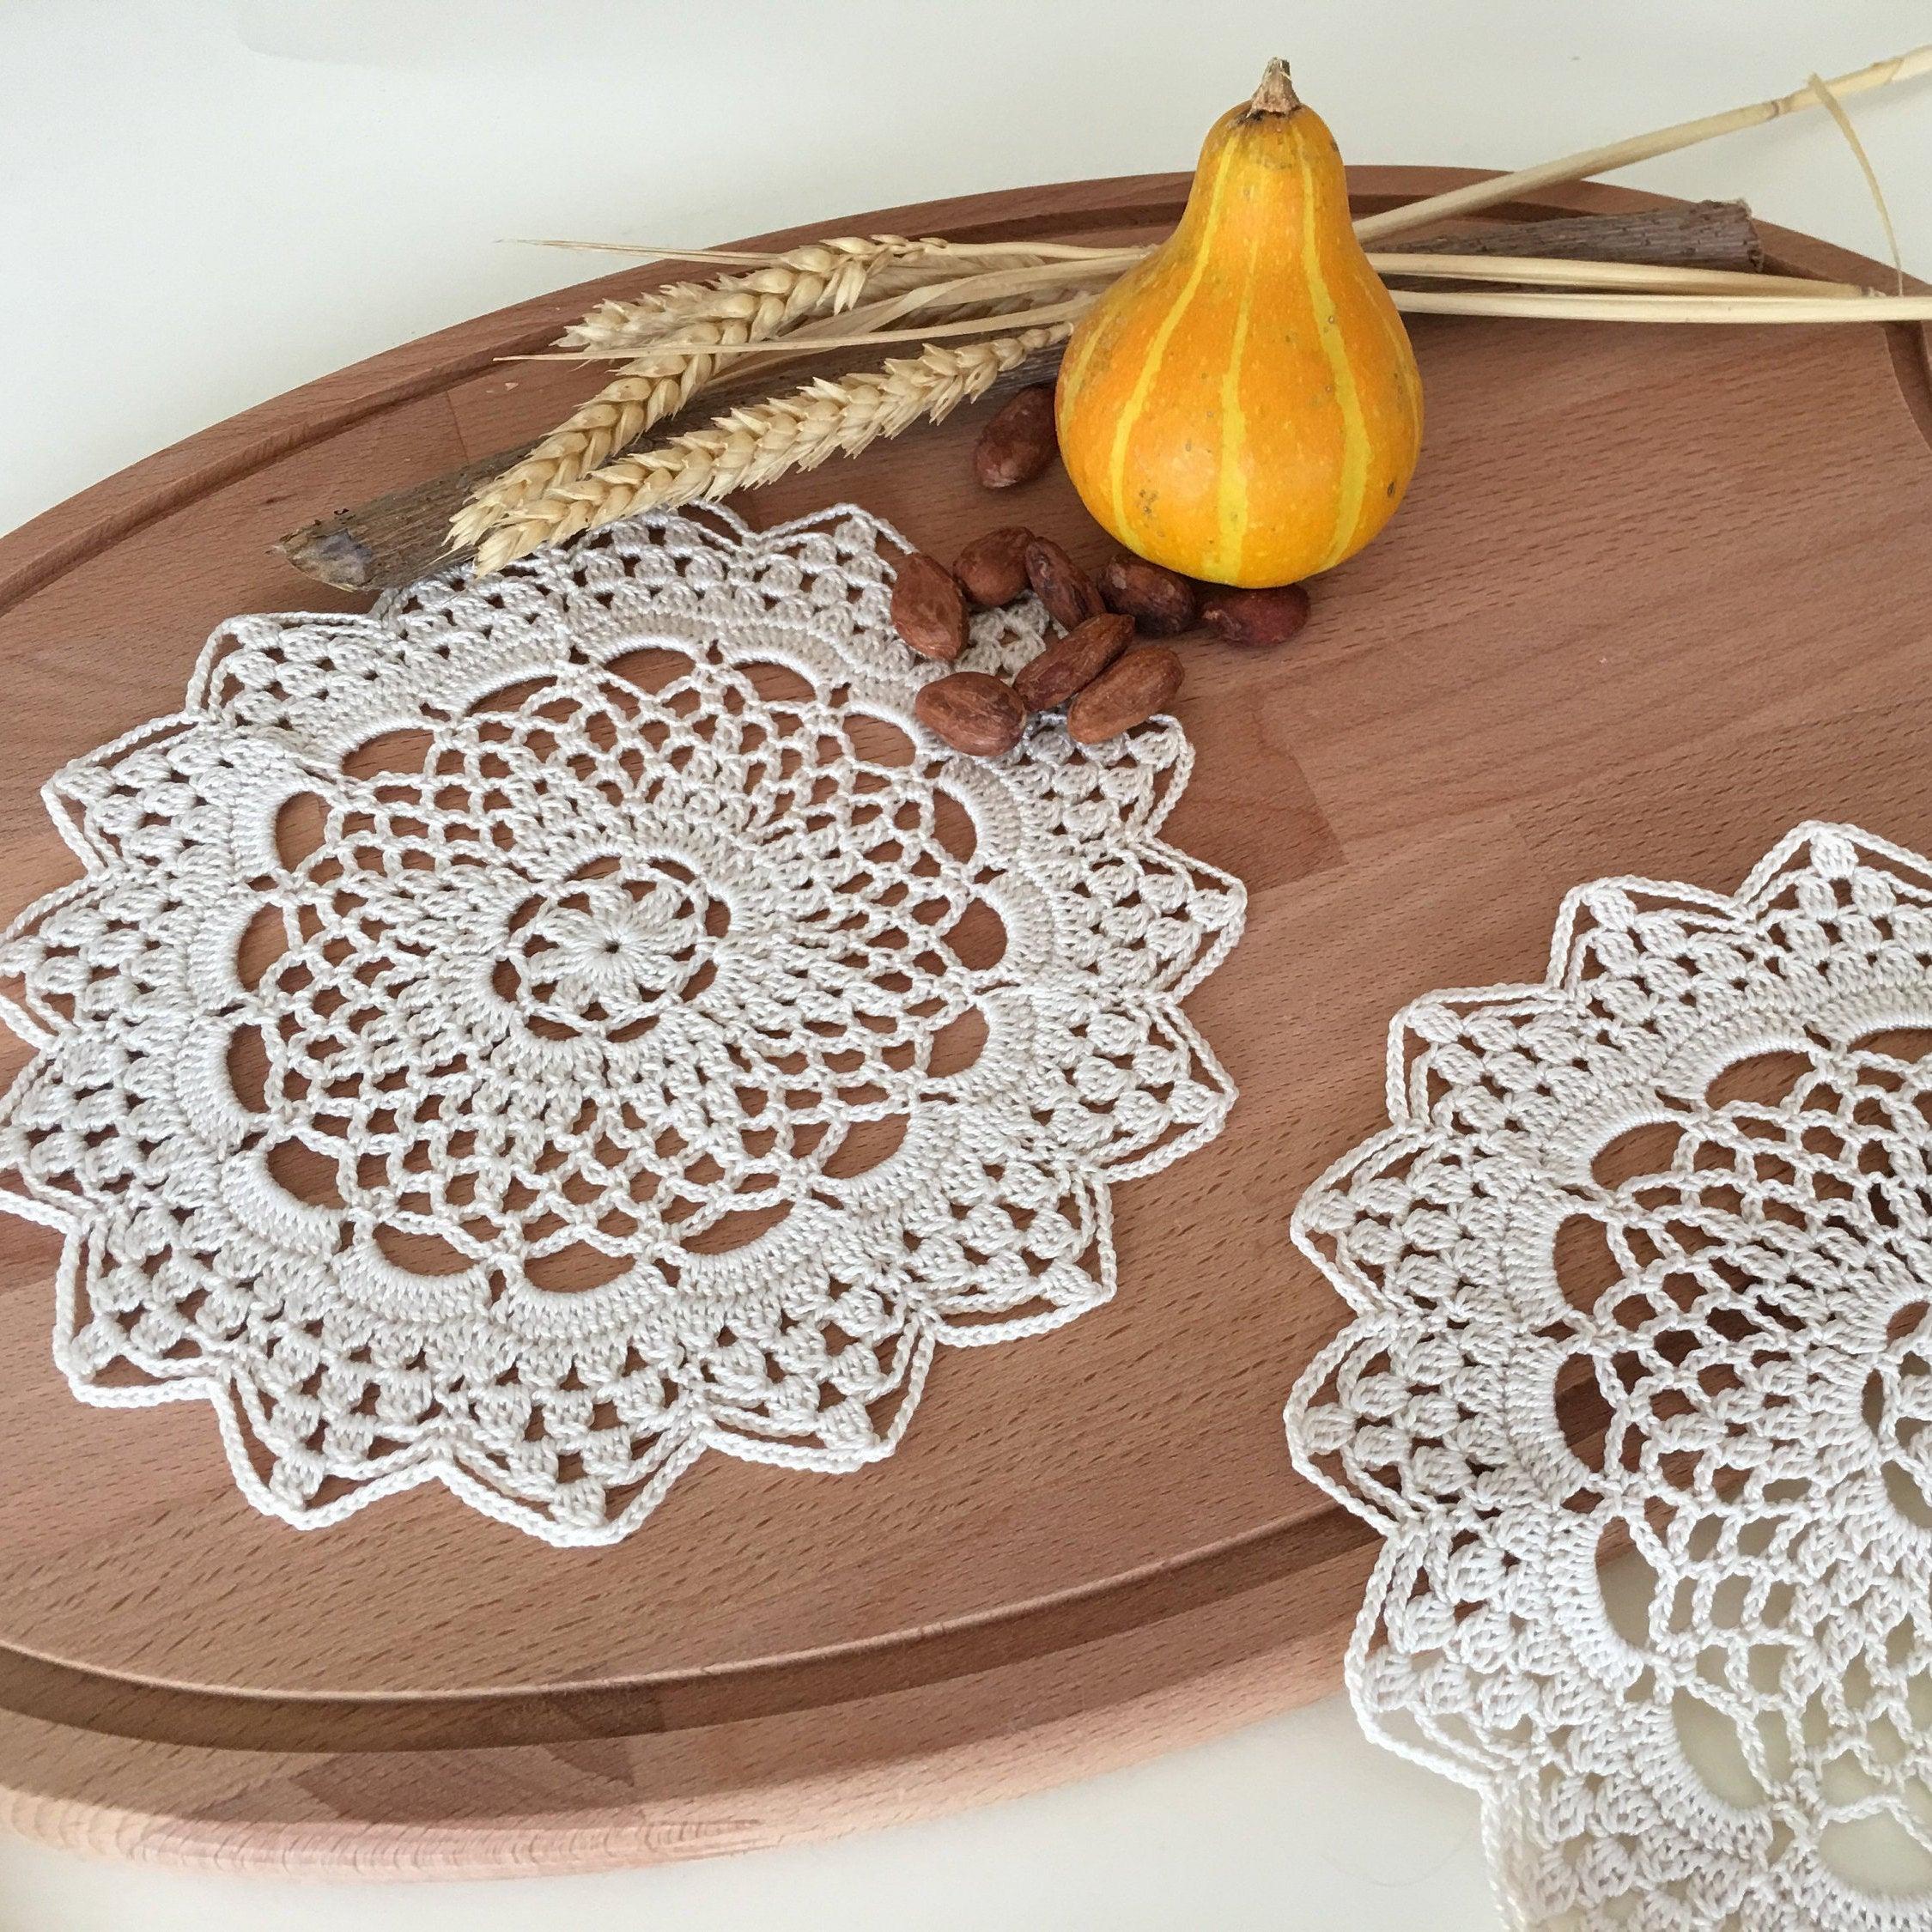 3 Pretty Designs of Craft Paper Doilies Rustic Craft Art Doily Kitchen Farmhouse Restaurant Decor Etsy